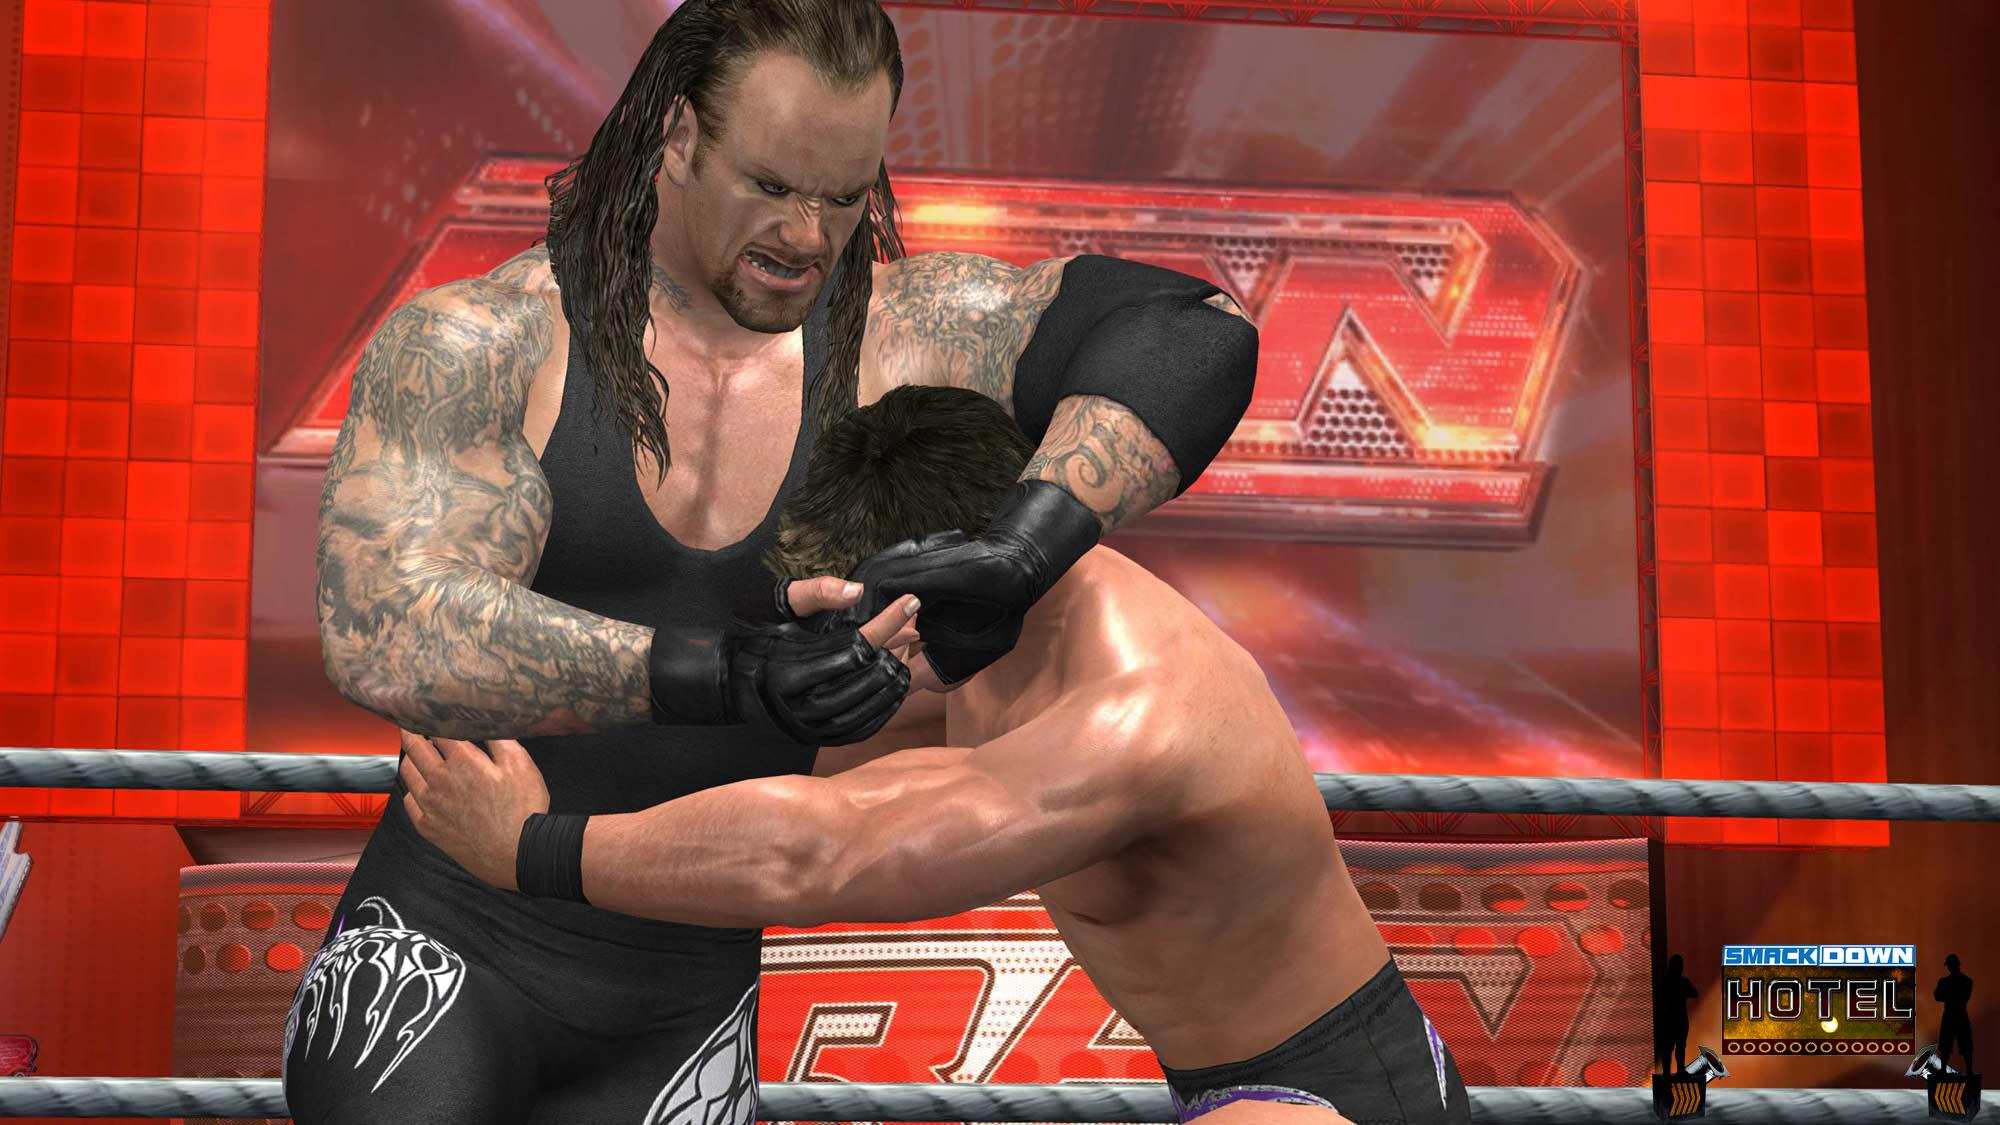 Promiere Image WWE SVR 2011 Wwesvr11communityexclus2-86e195d949